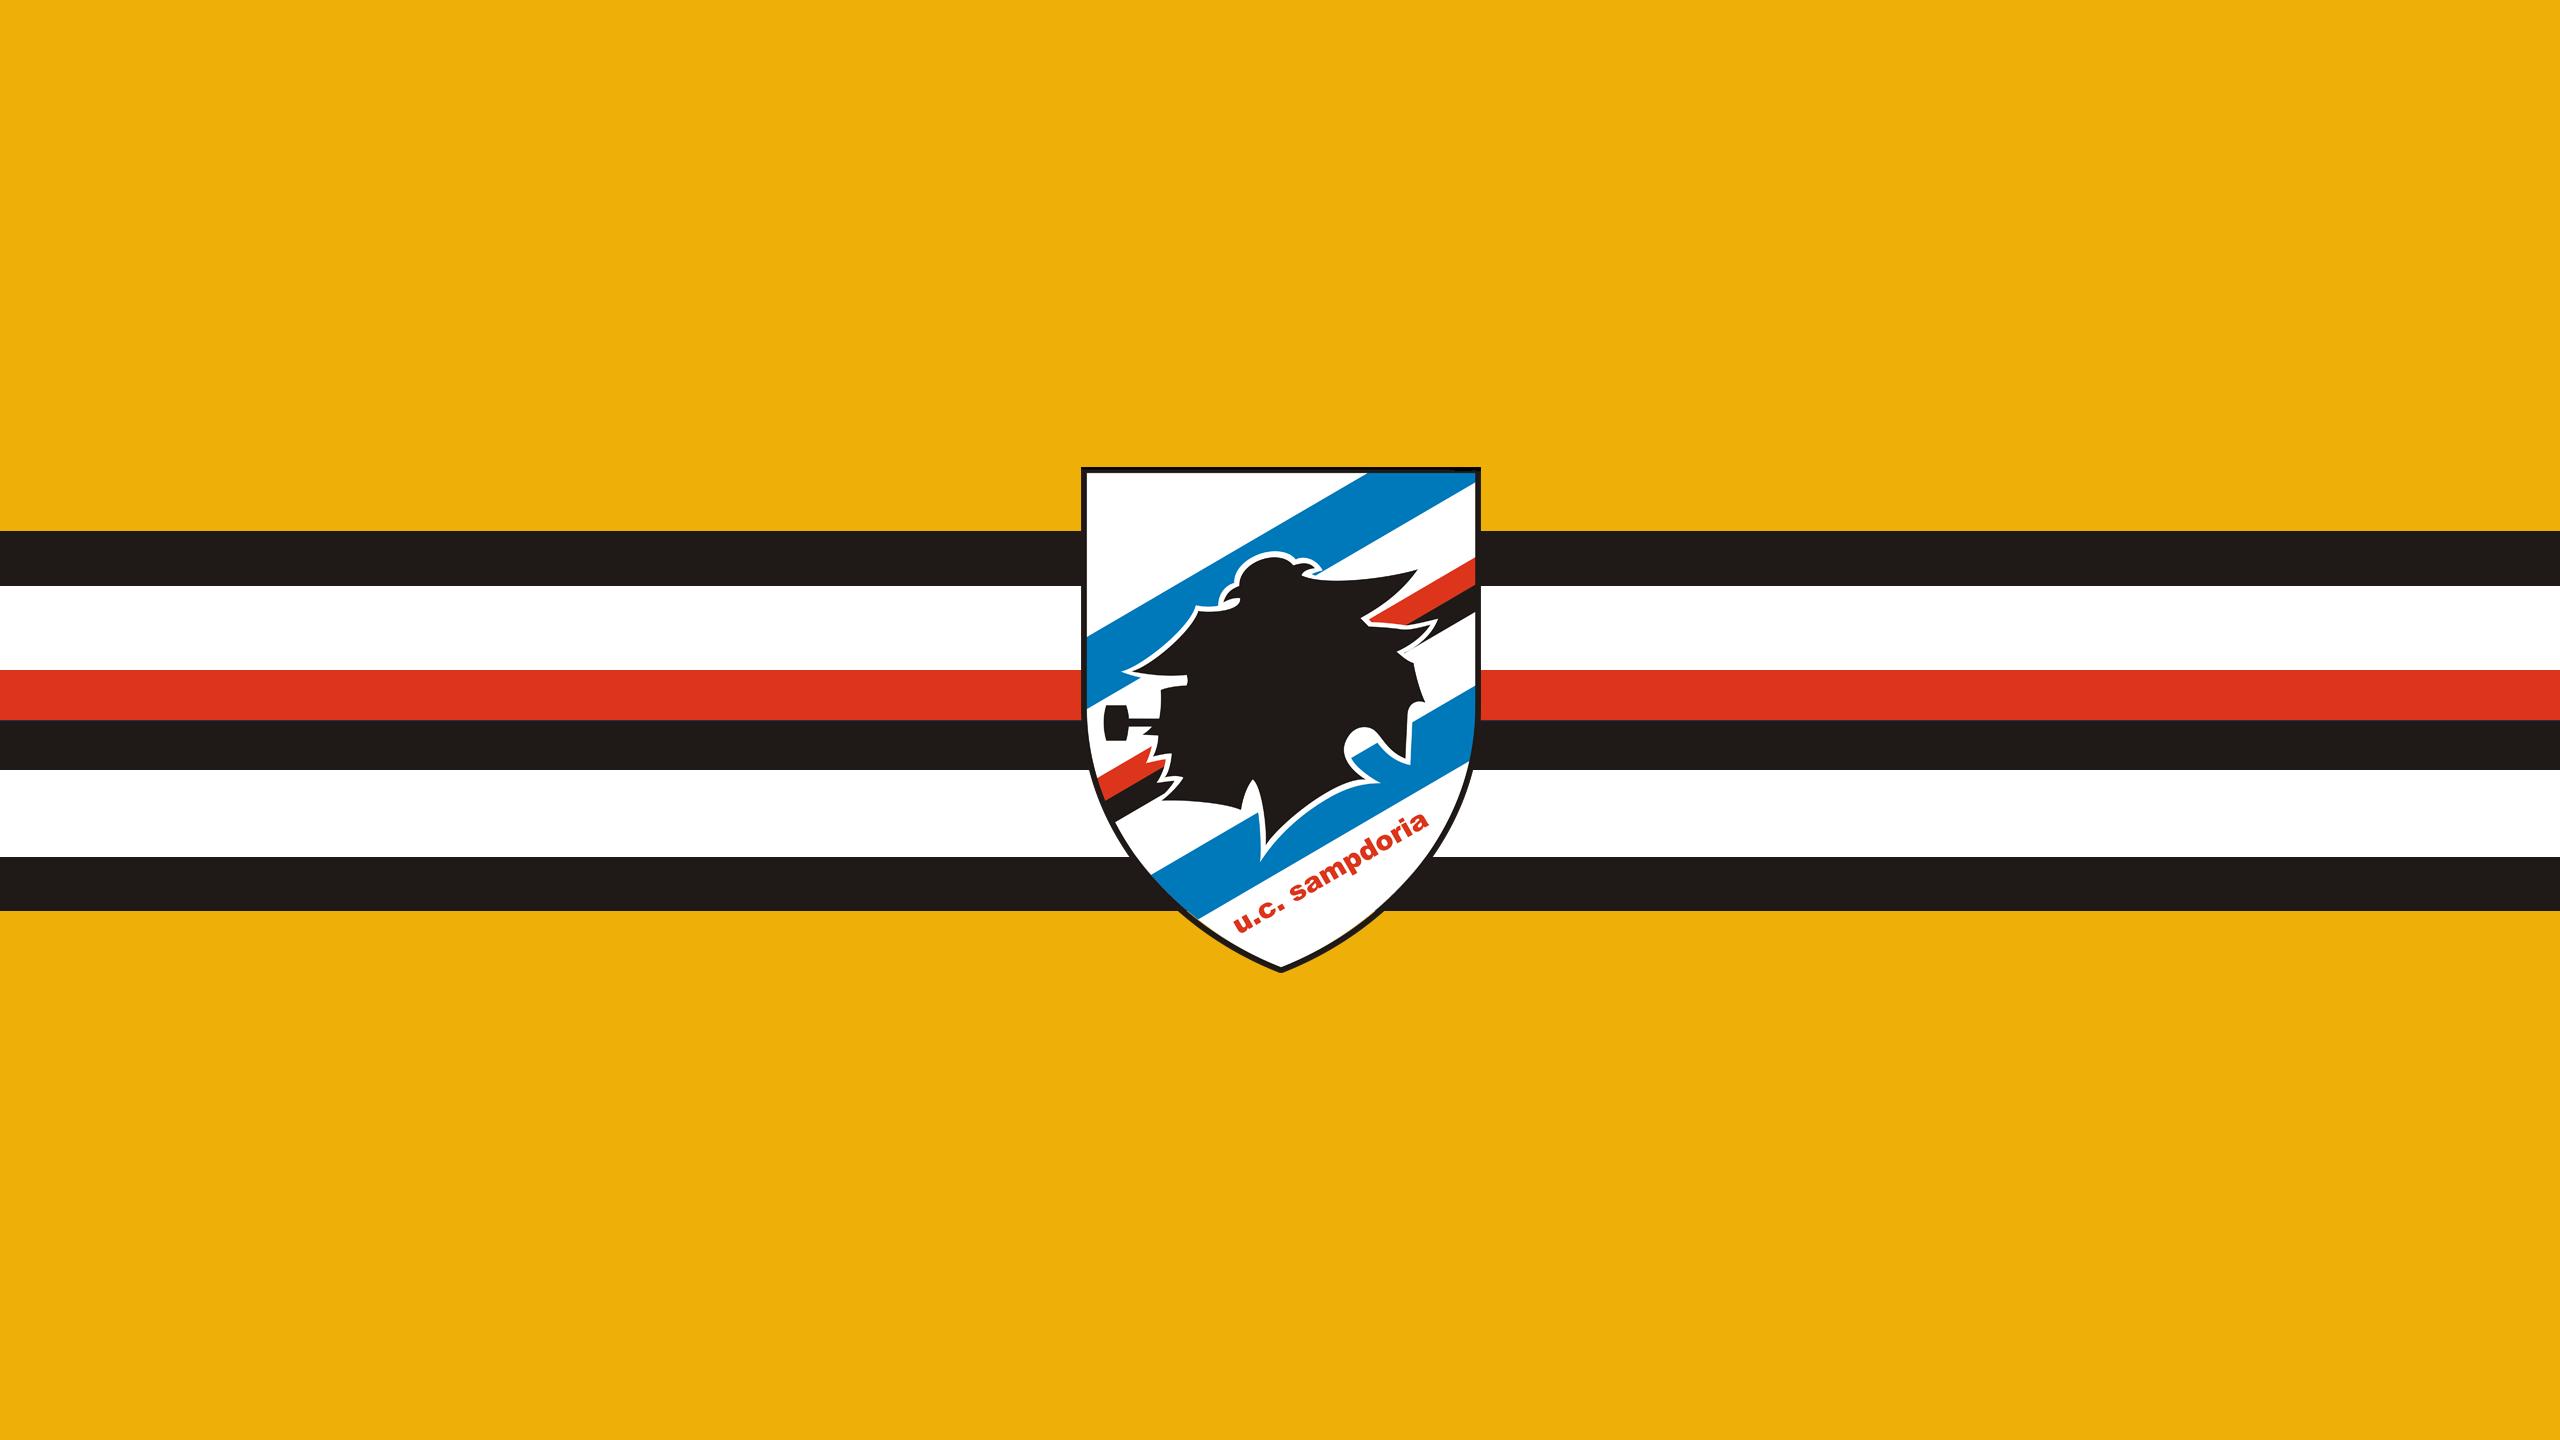 U.C. Sampdoria (Third)